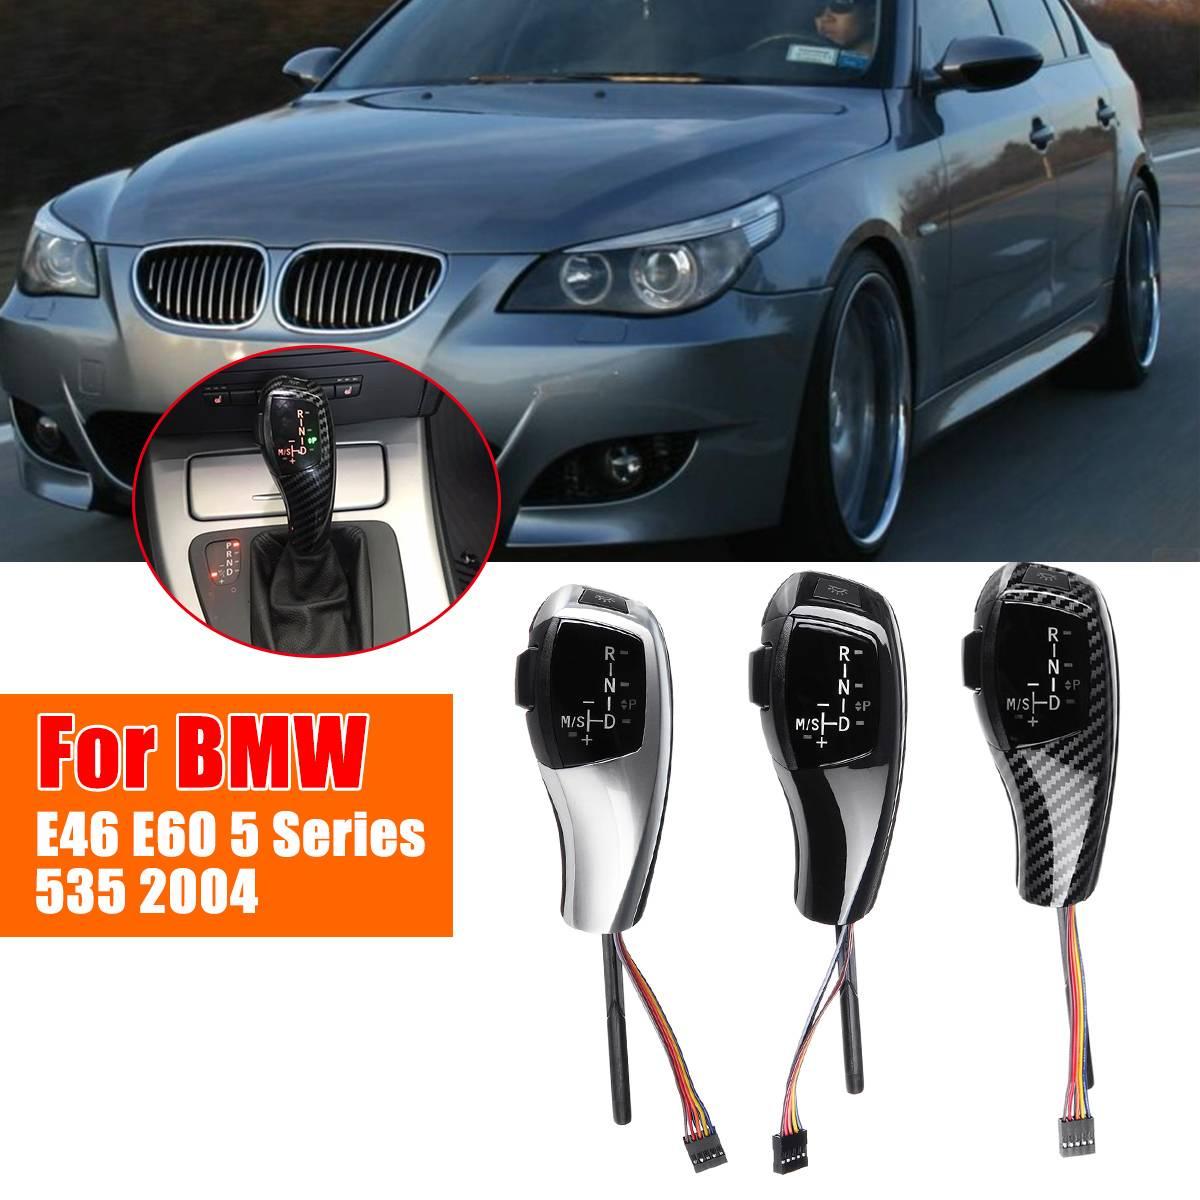 LED levier de levier de vitesse manuel 83mm bouton automatique pour BMW E39 E46 E53 E60 E61 5 série X3 E83 LCI berline coupé